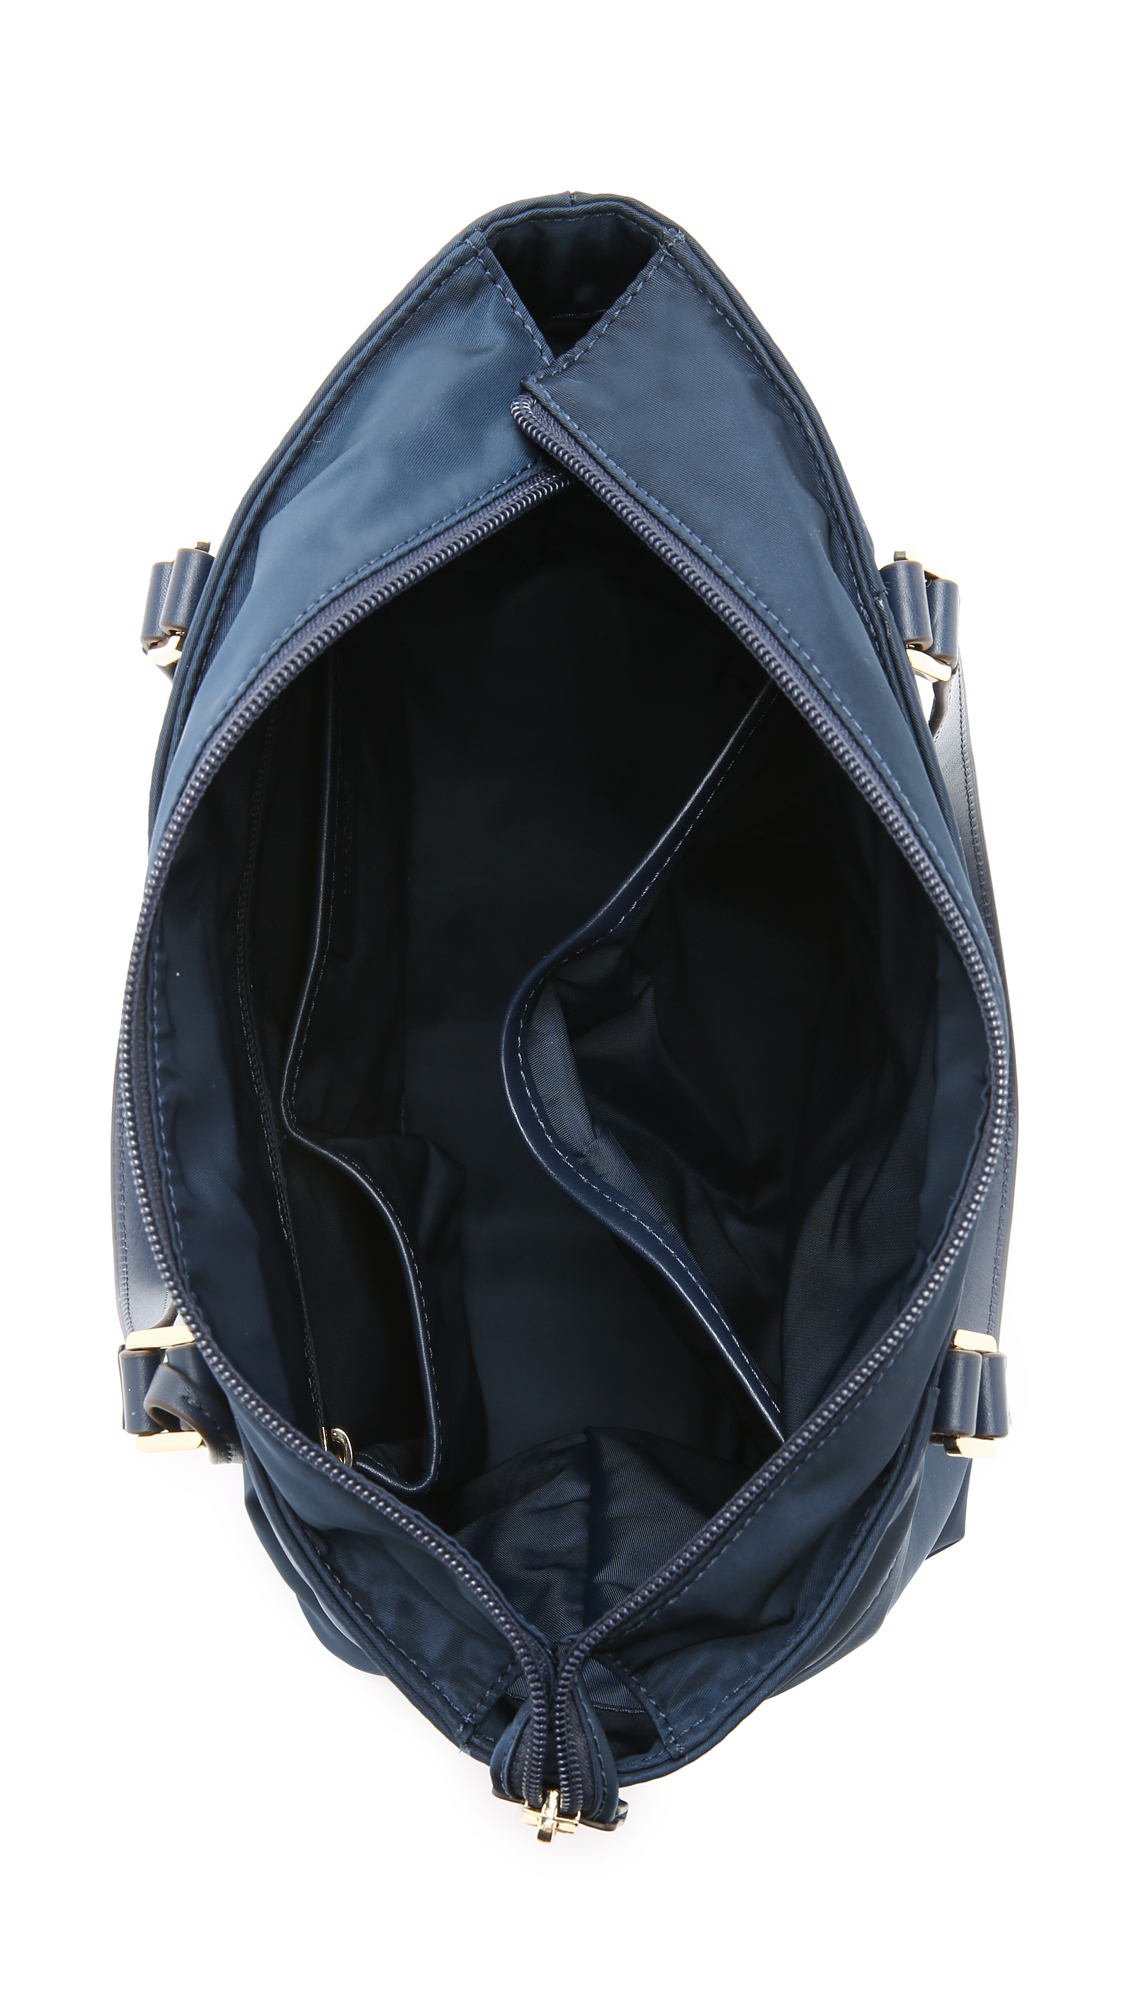 a7a4d86cb1d0 ... where to buy lyst michael michael kors morgan medium tote navy in blue  37304 1732f